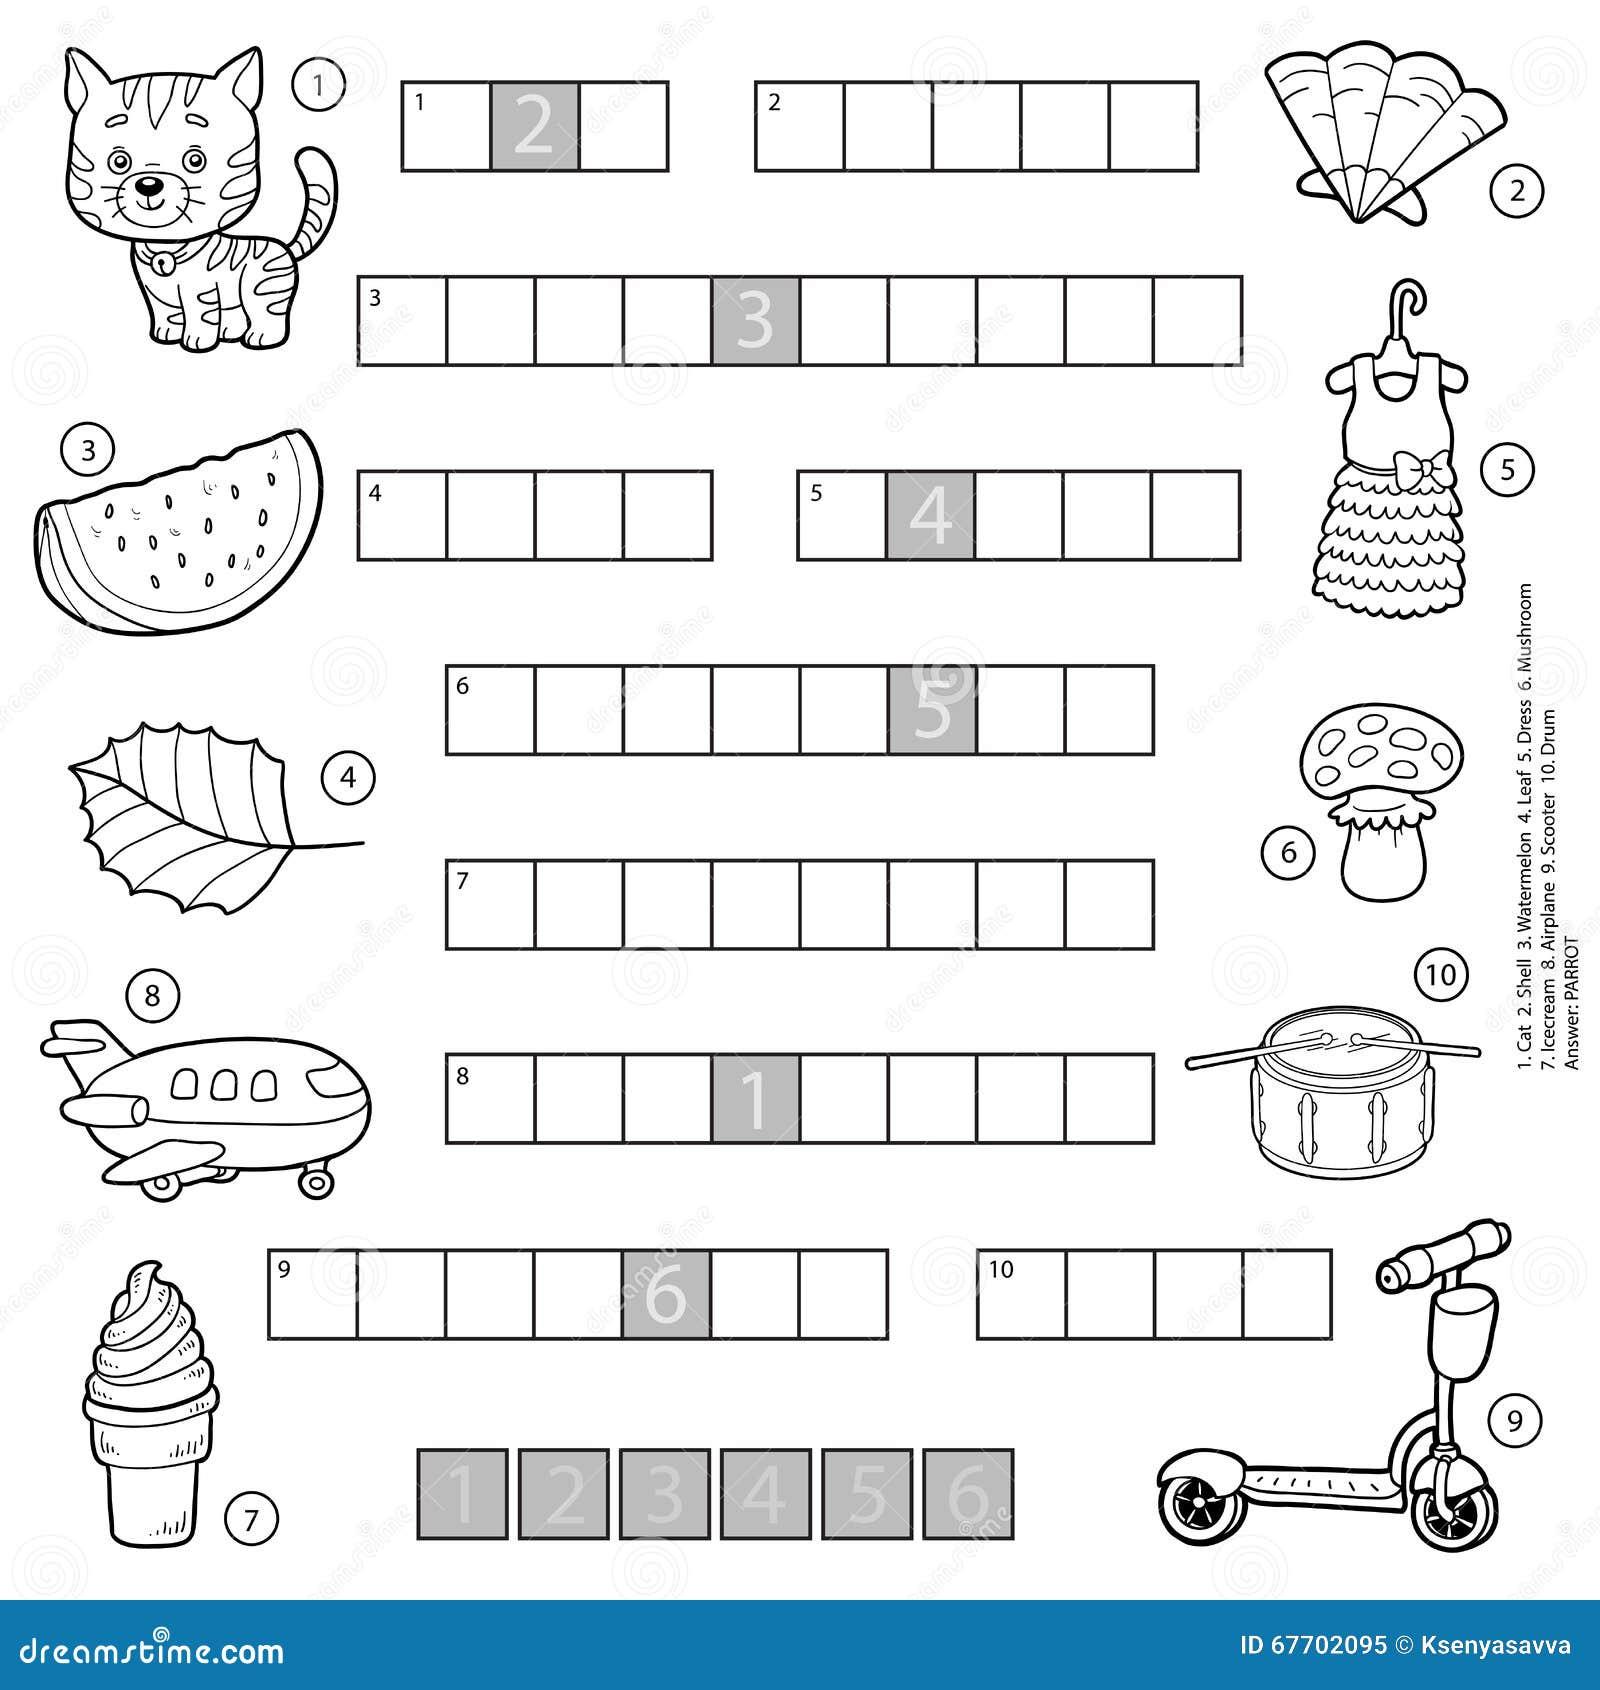 vector farbloses kreuzwortr tsel bildungsspiel f r kinder vektor abbildung illustration von. Black Bedroom Furniture Sets. Home Design Ideas